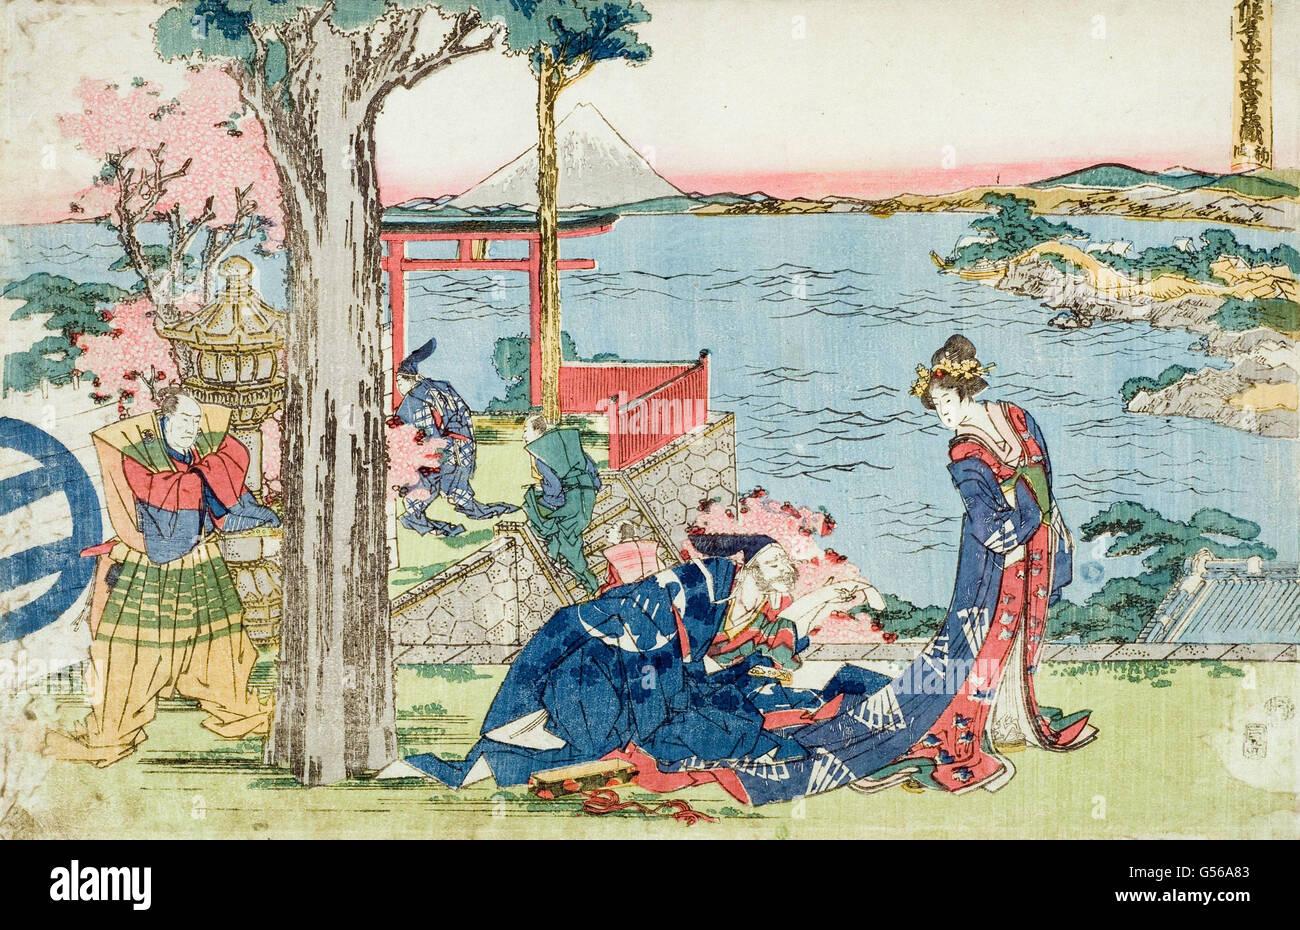 Katsushika Hokusai - la xilografia Immagini Stock